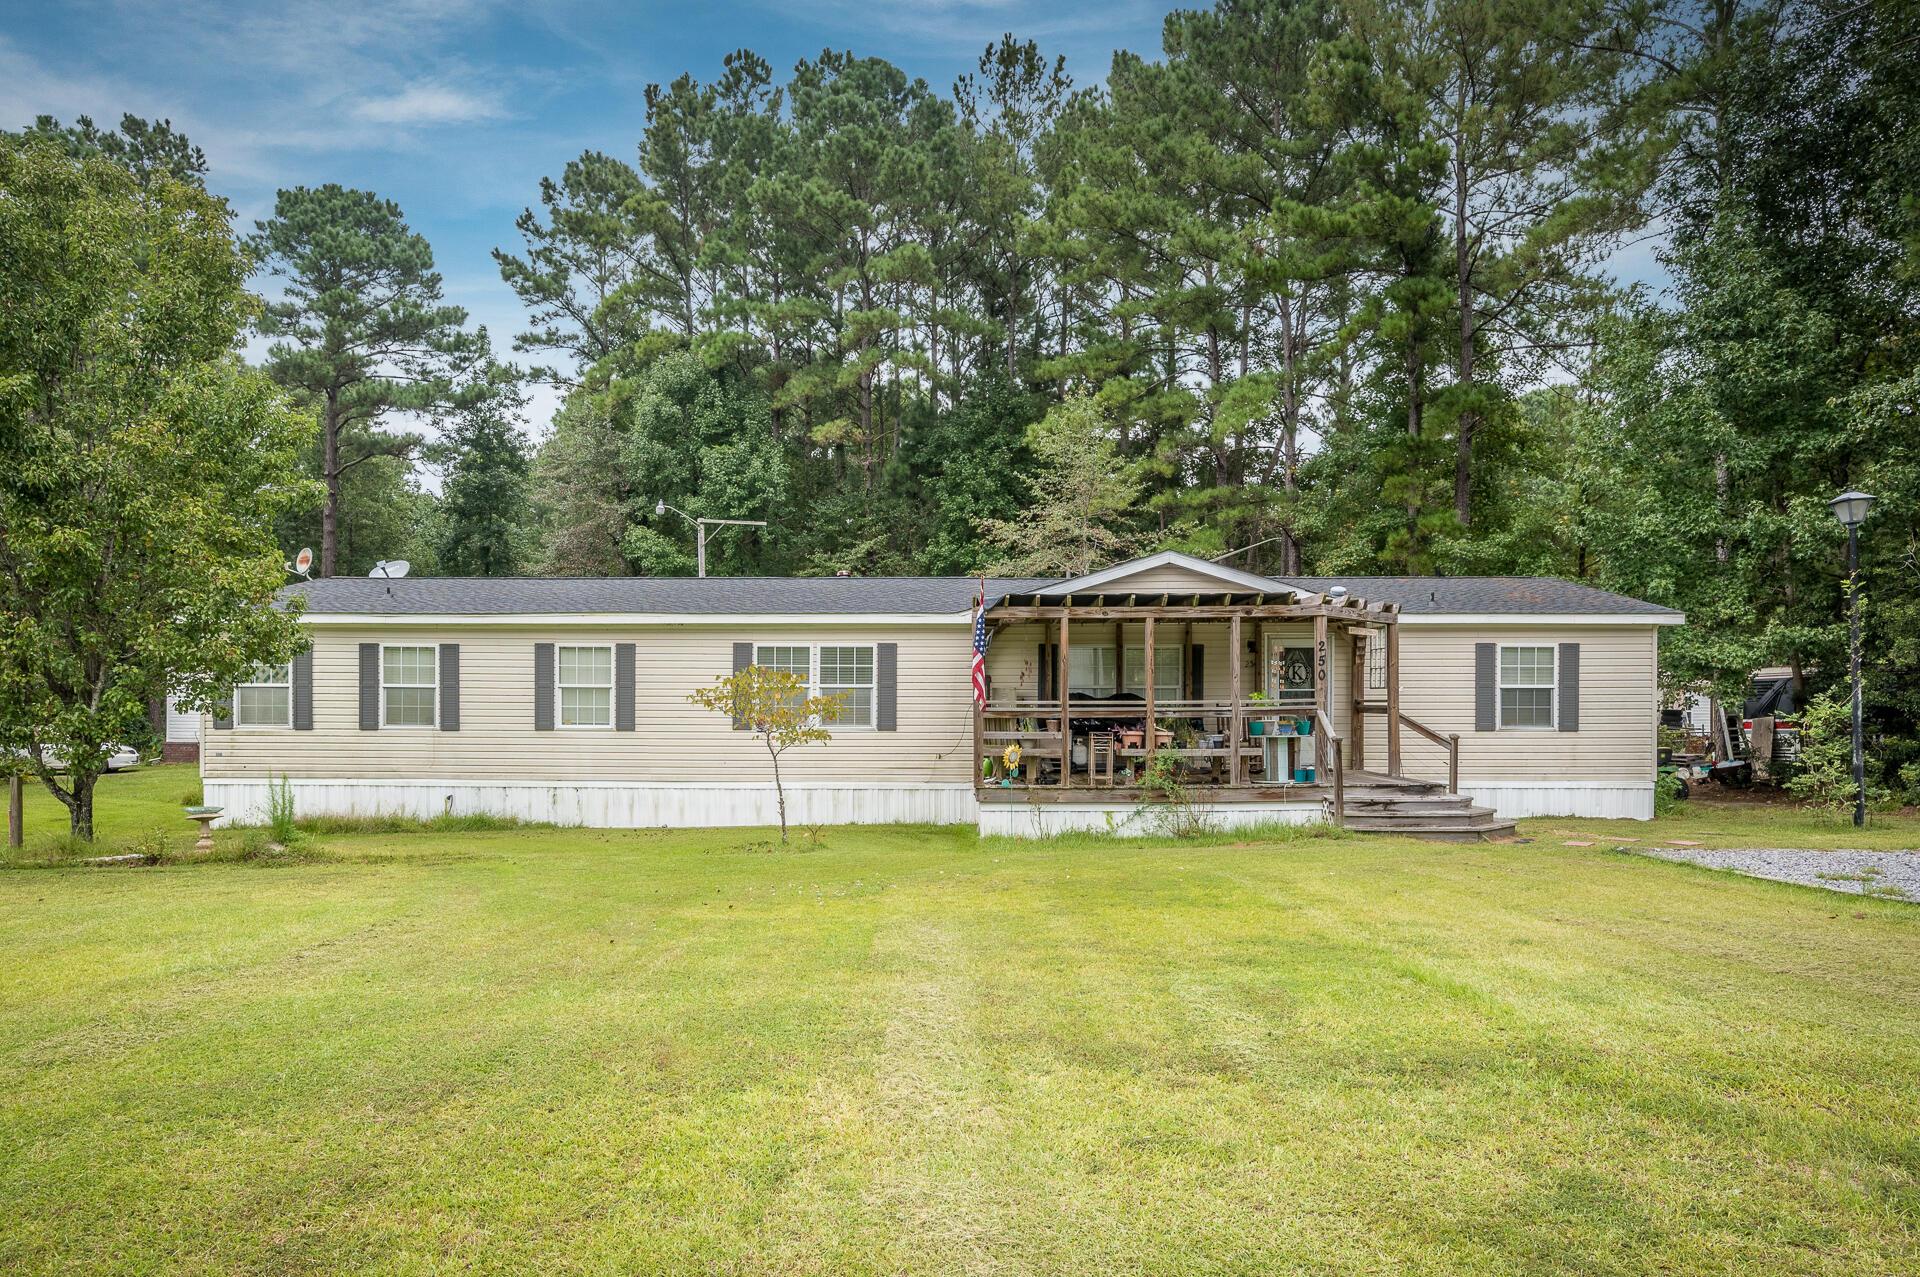 Clemson Terrace Homes For Sale - 250 Medina, Summerville, SC - 7